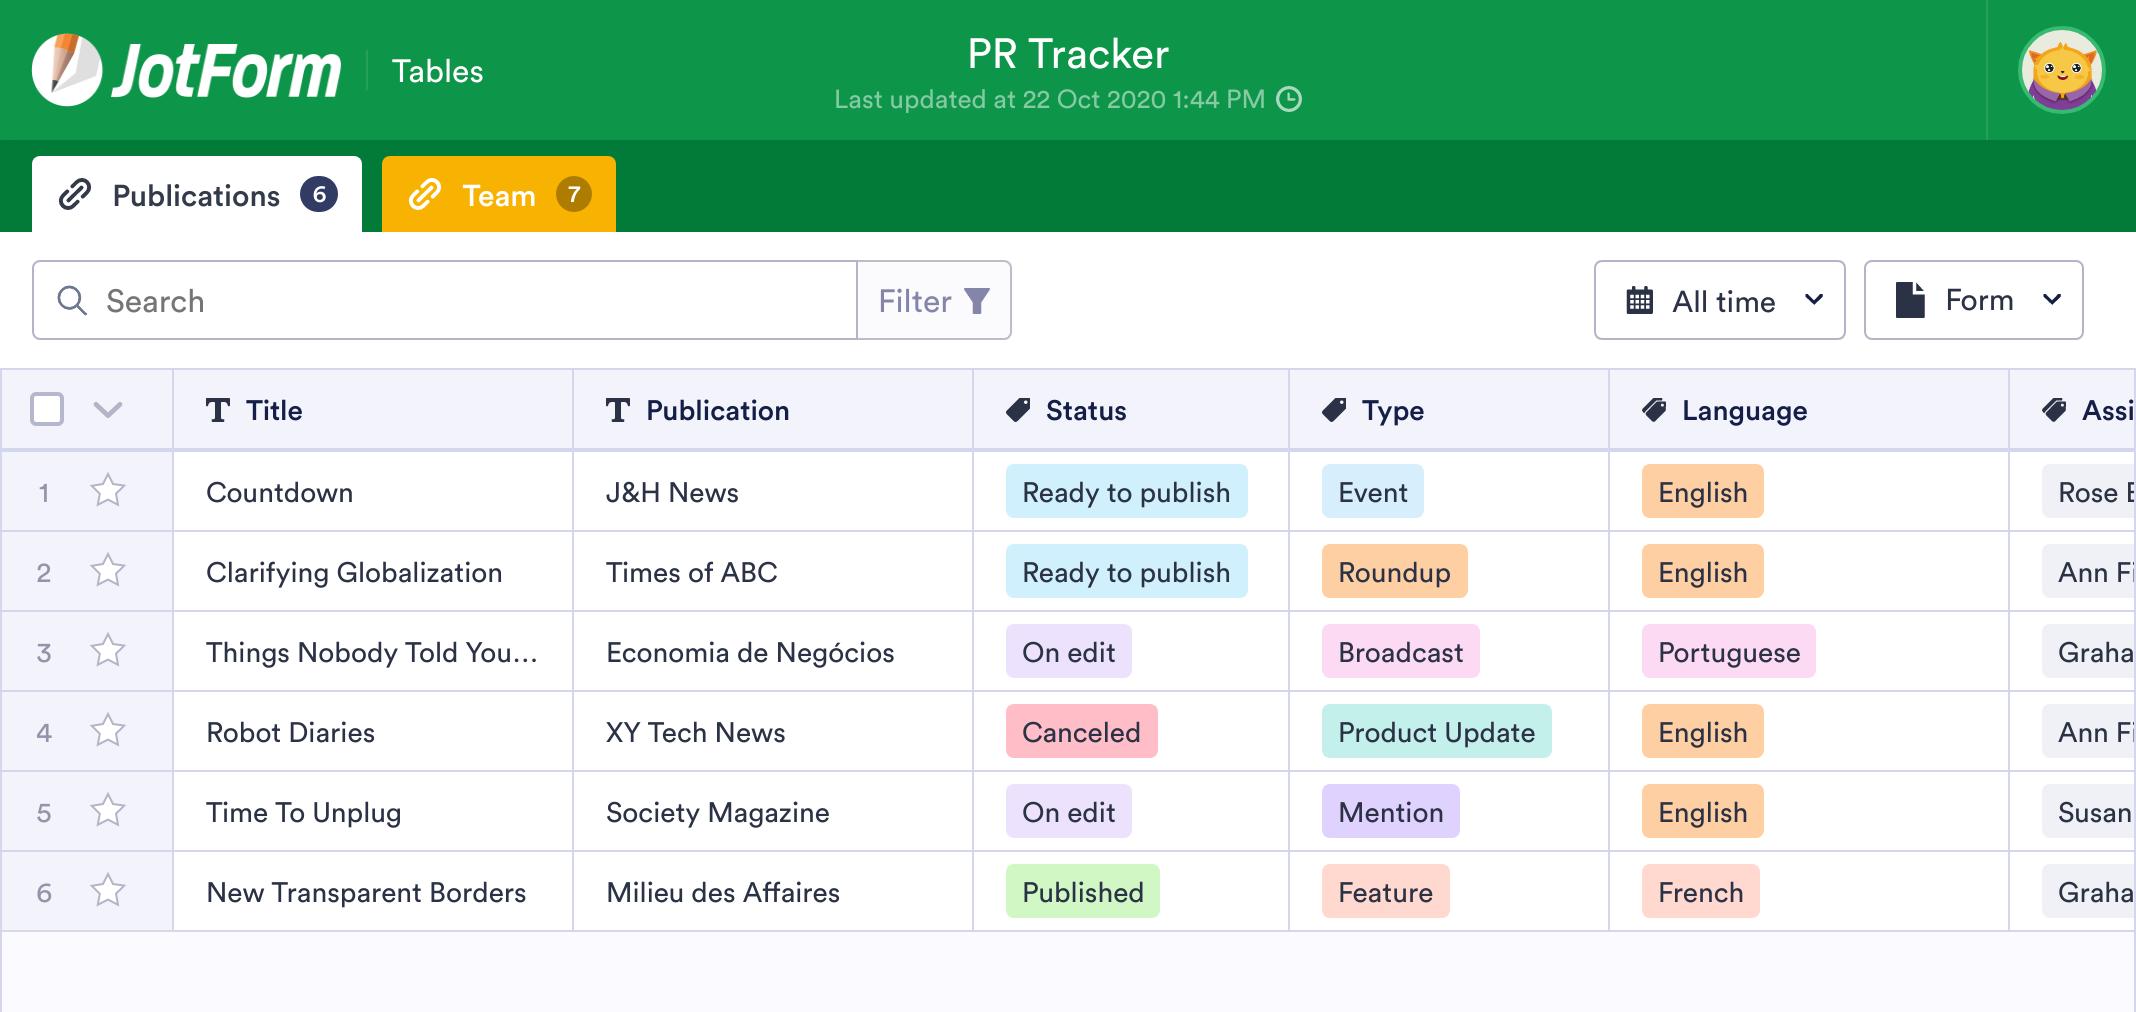 PR Tracker